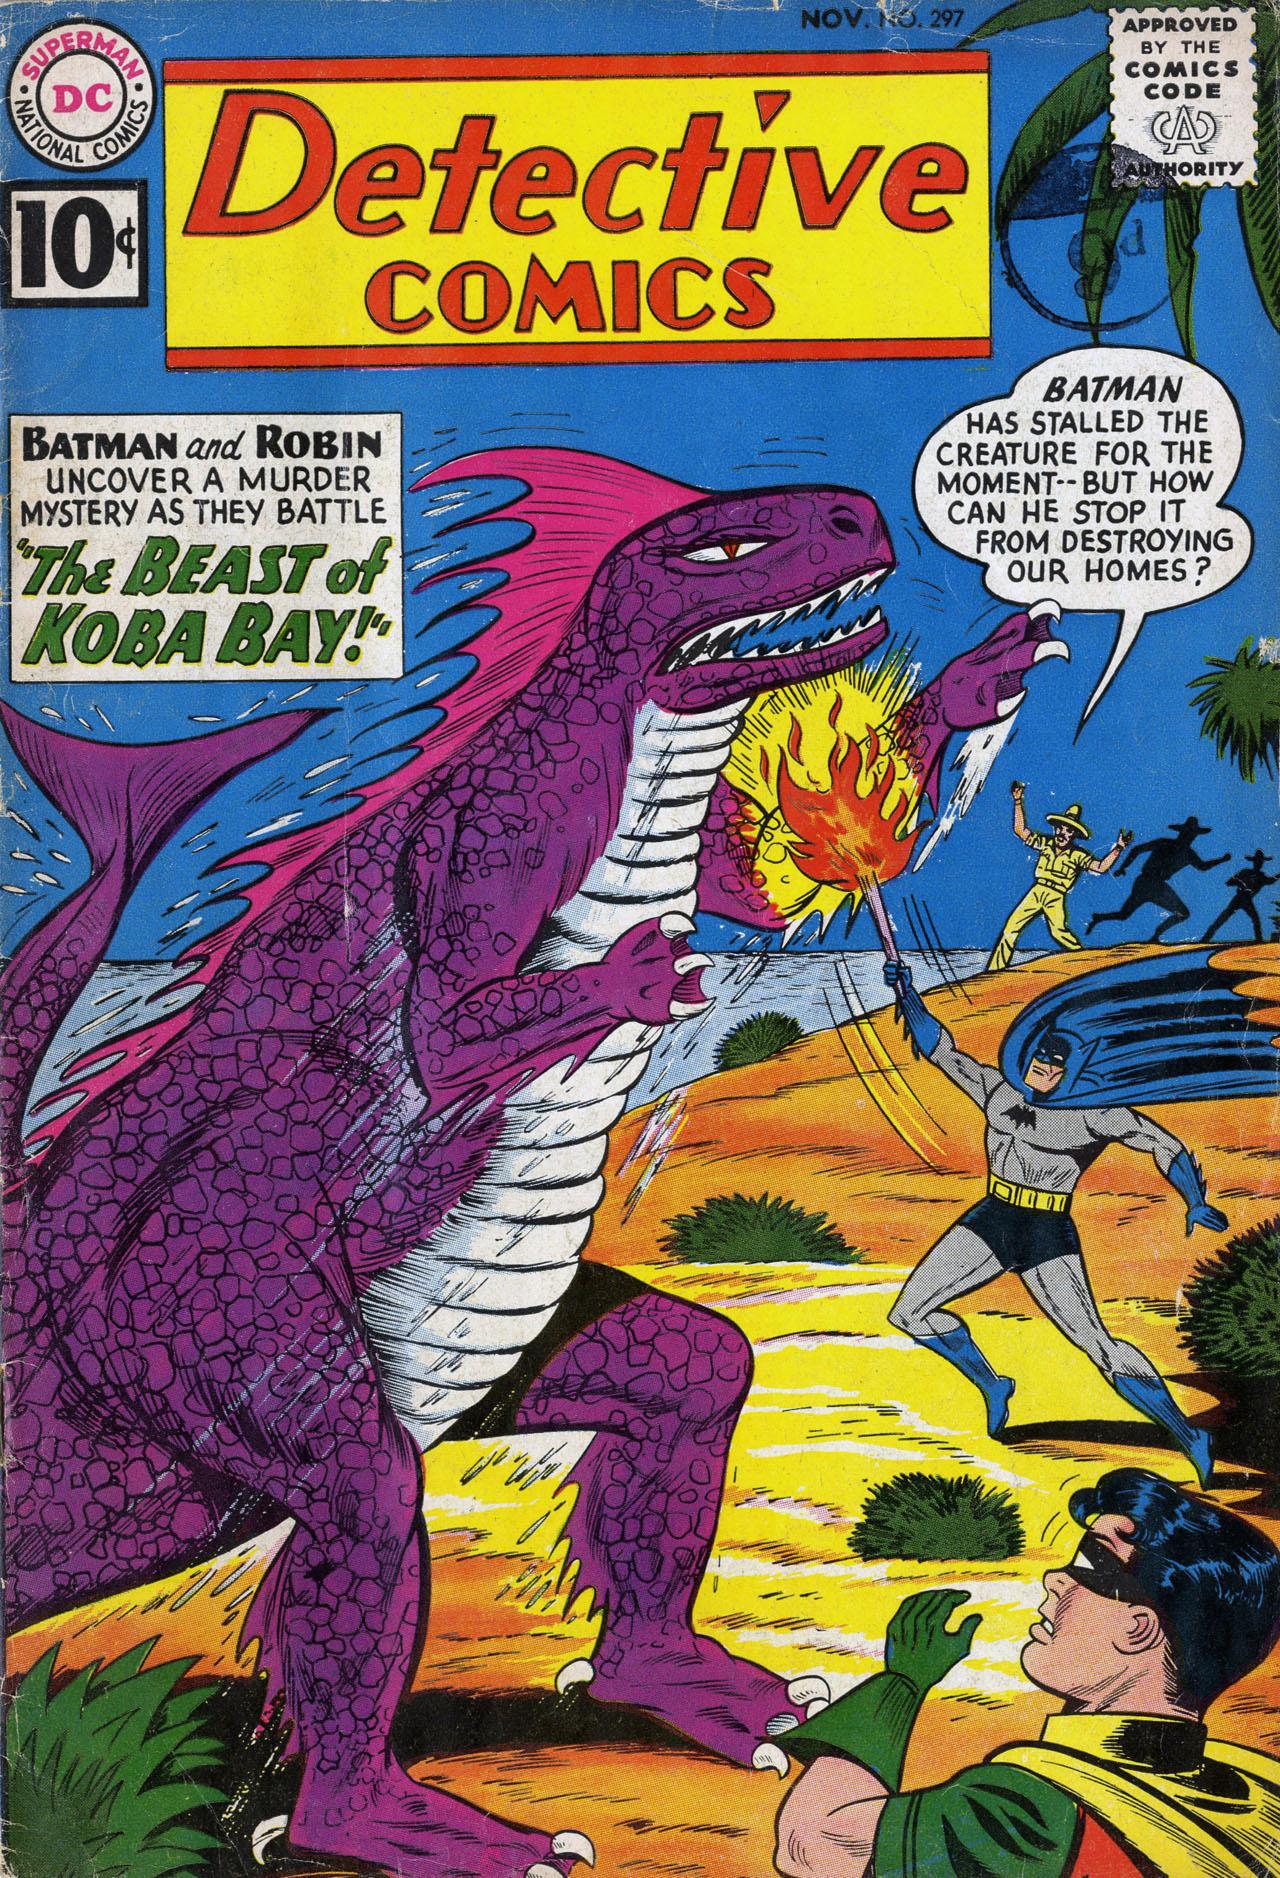 Detective Comics (1937) 297 Page 1